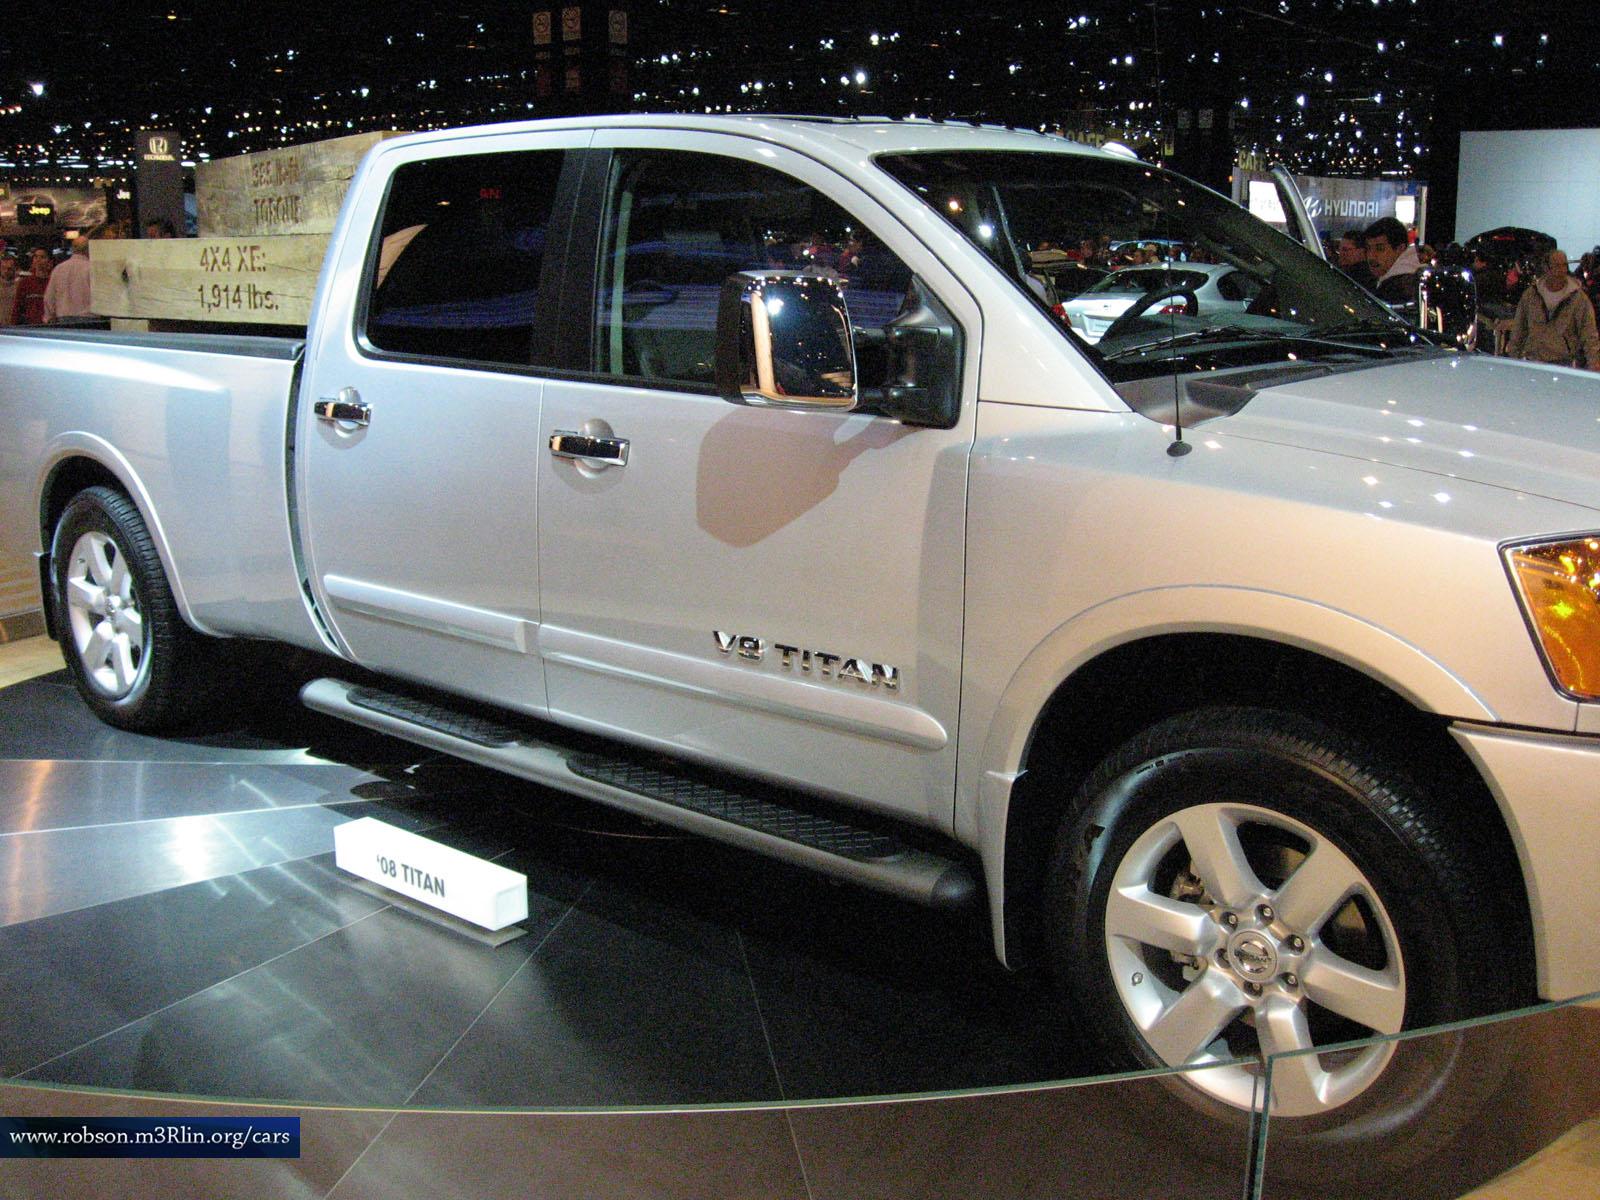 nissan titan se v6 photos news reviews specs car listings